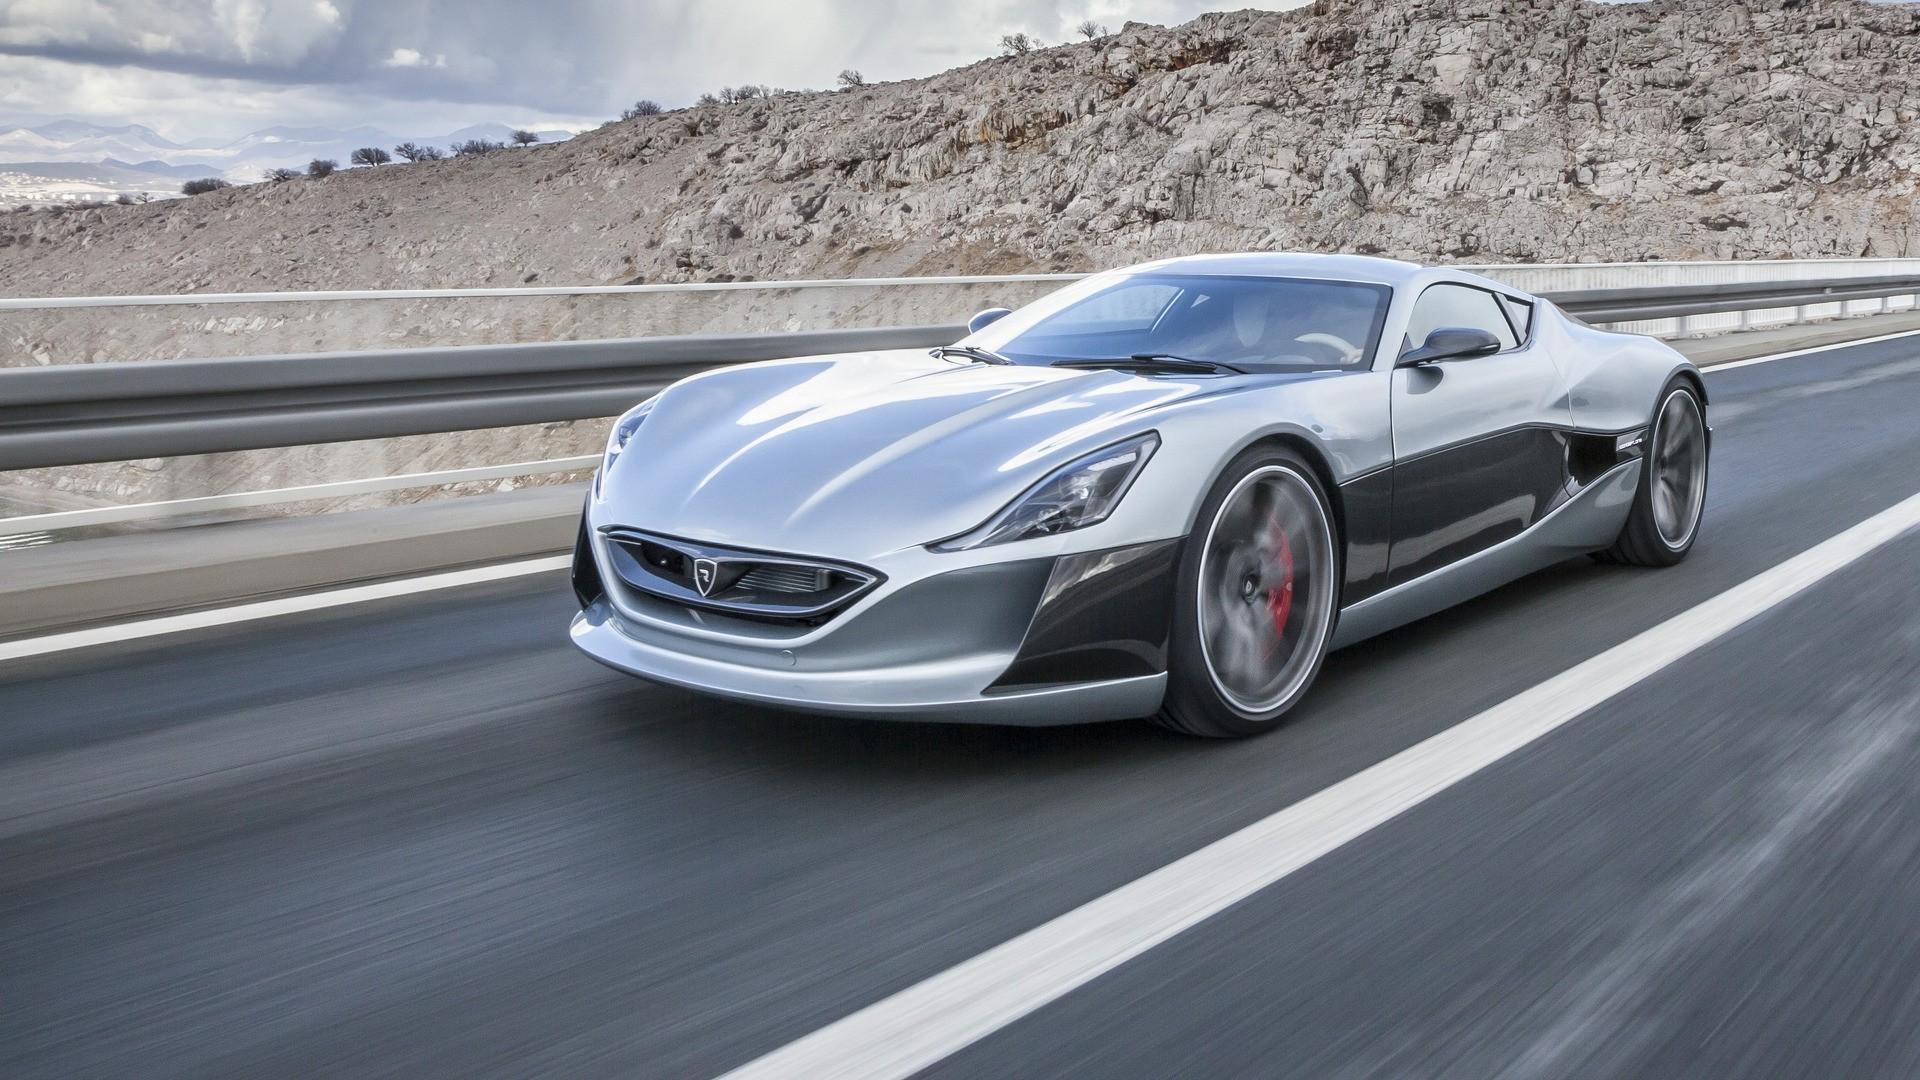 Хорватский электрический концепт-кар превосходит по динамике Bugatti Veyron